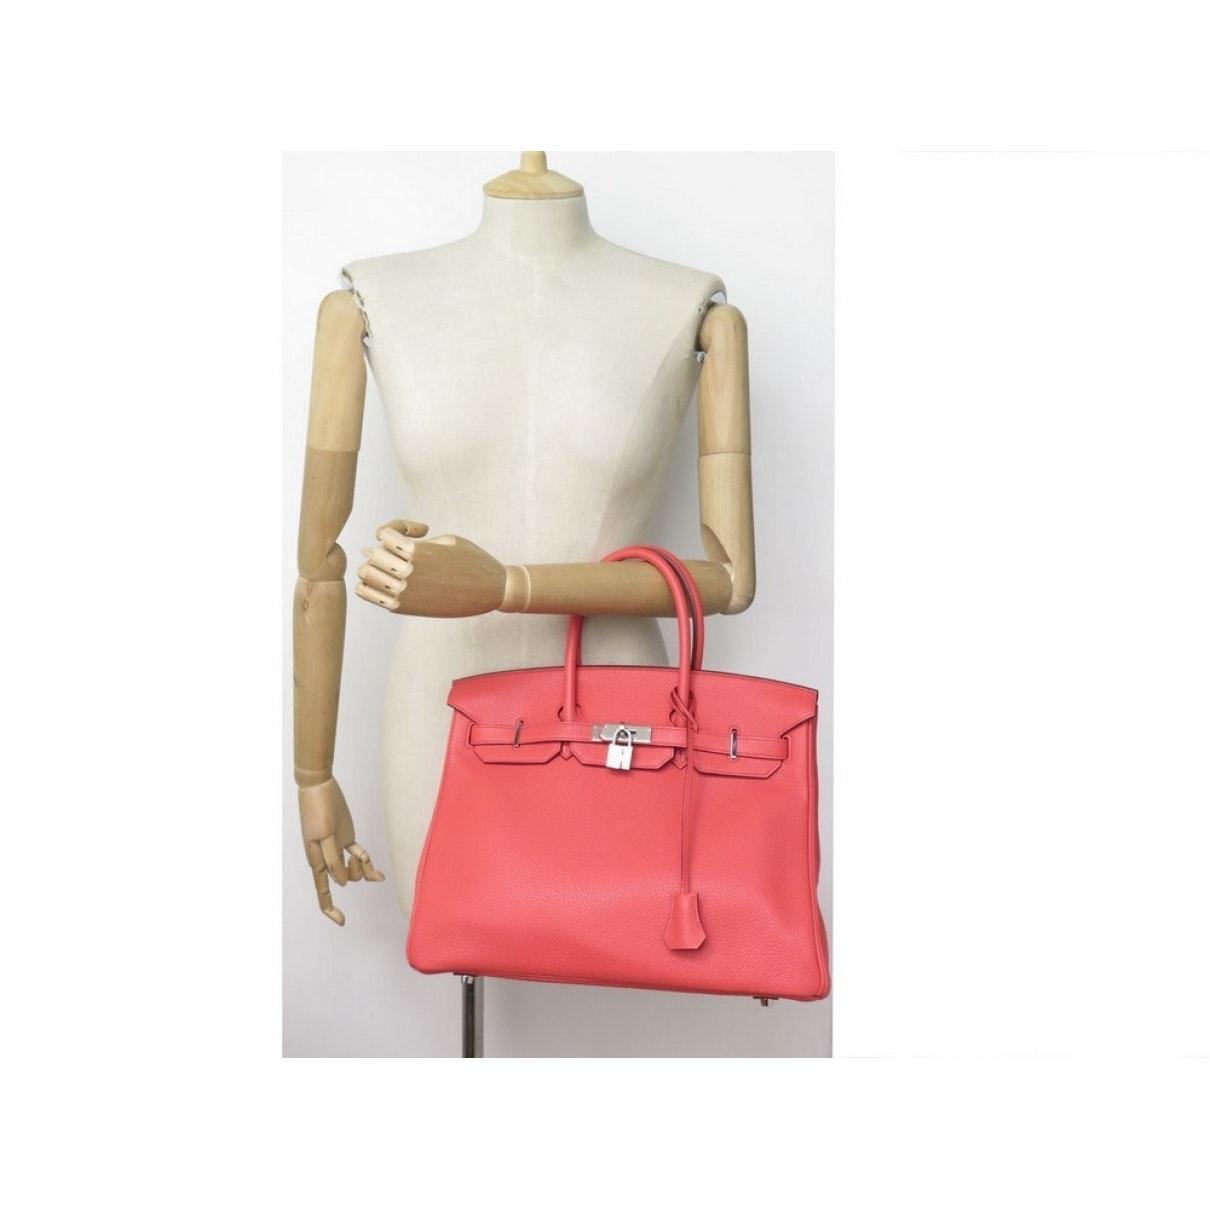 Sac à main Birkin 35 en Cuir Rose Hermès en coloris Rouge X5zA